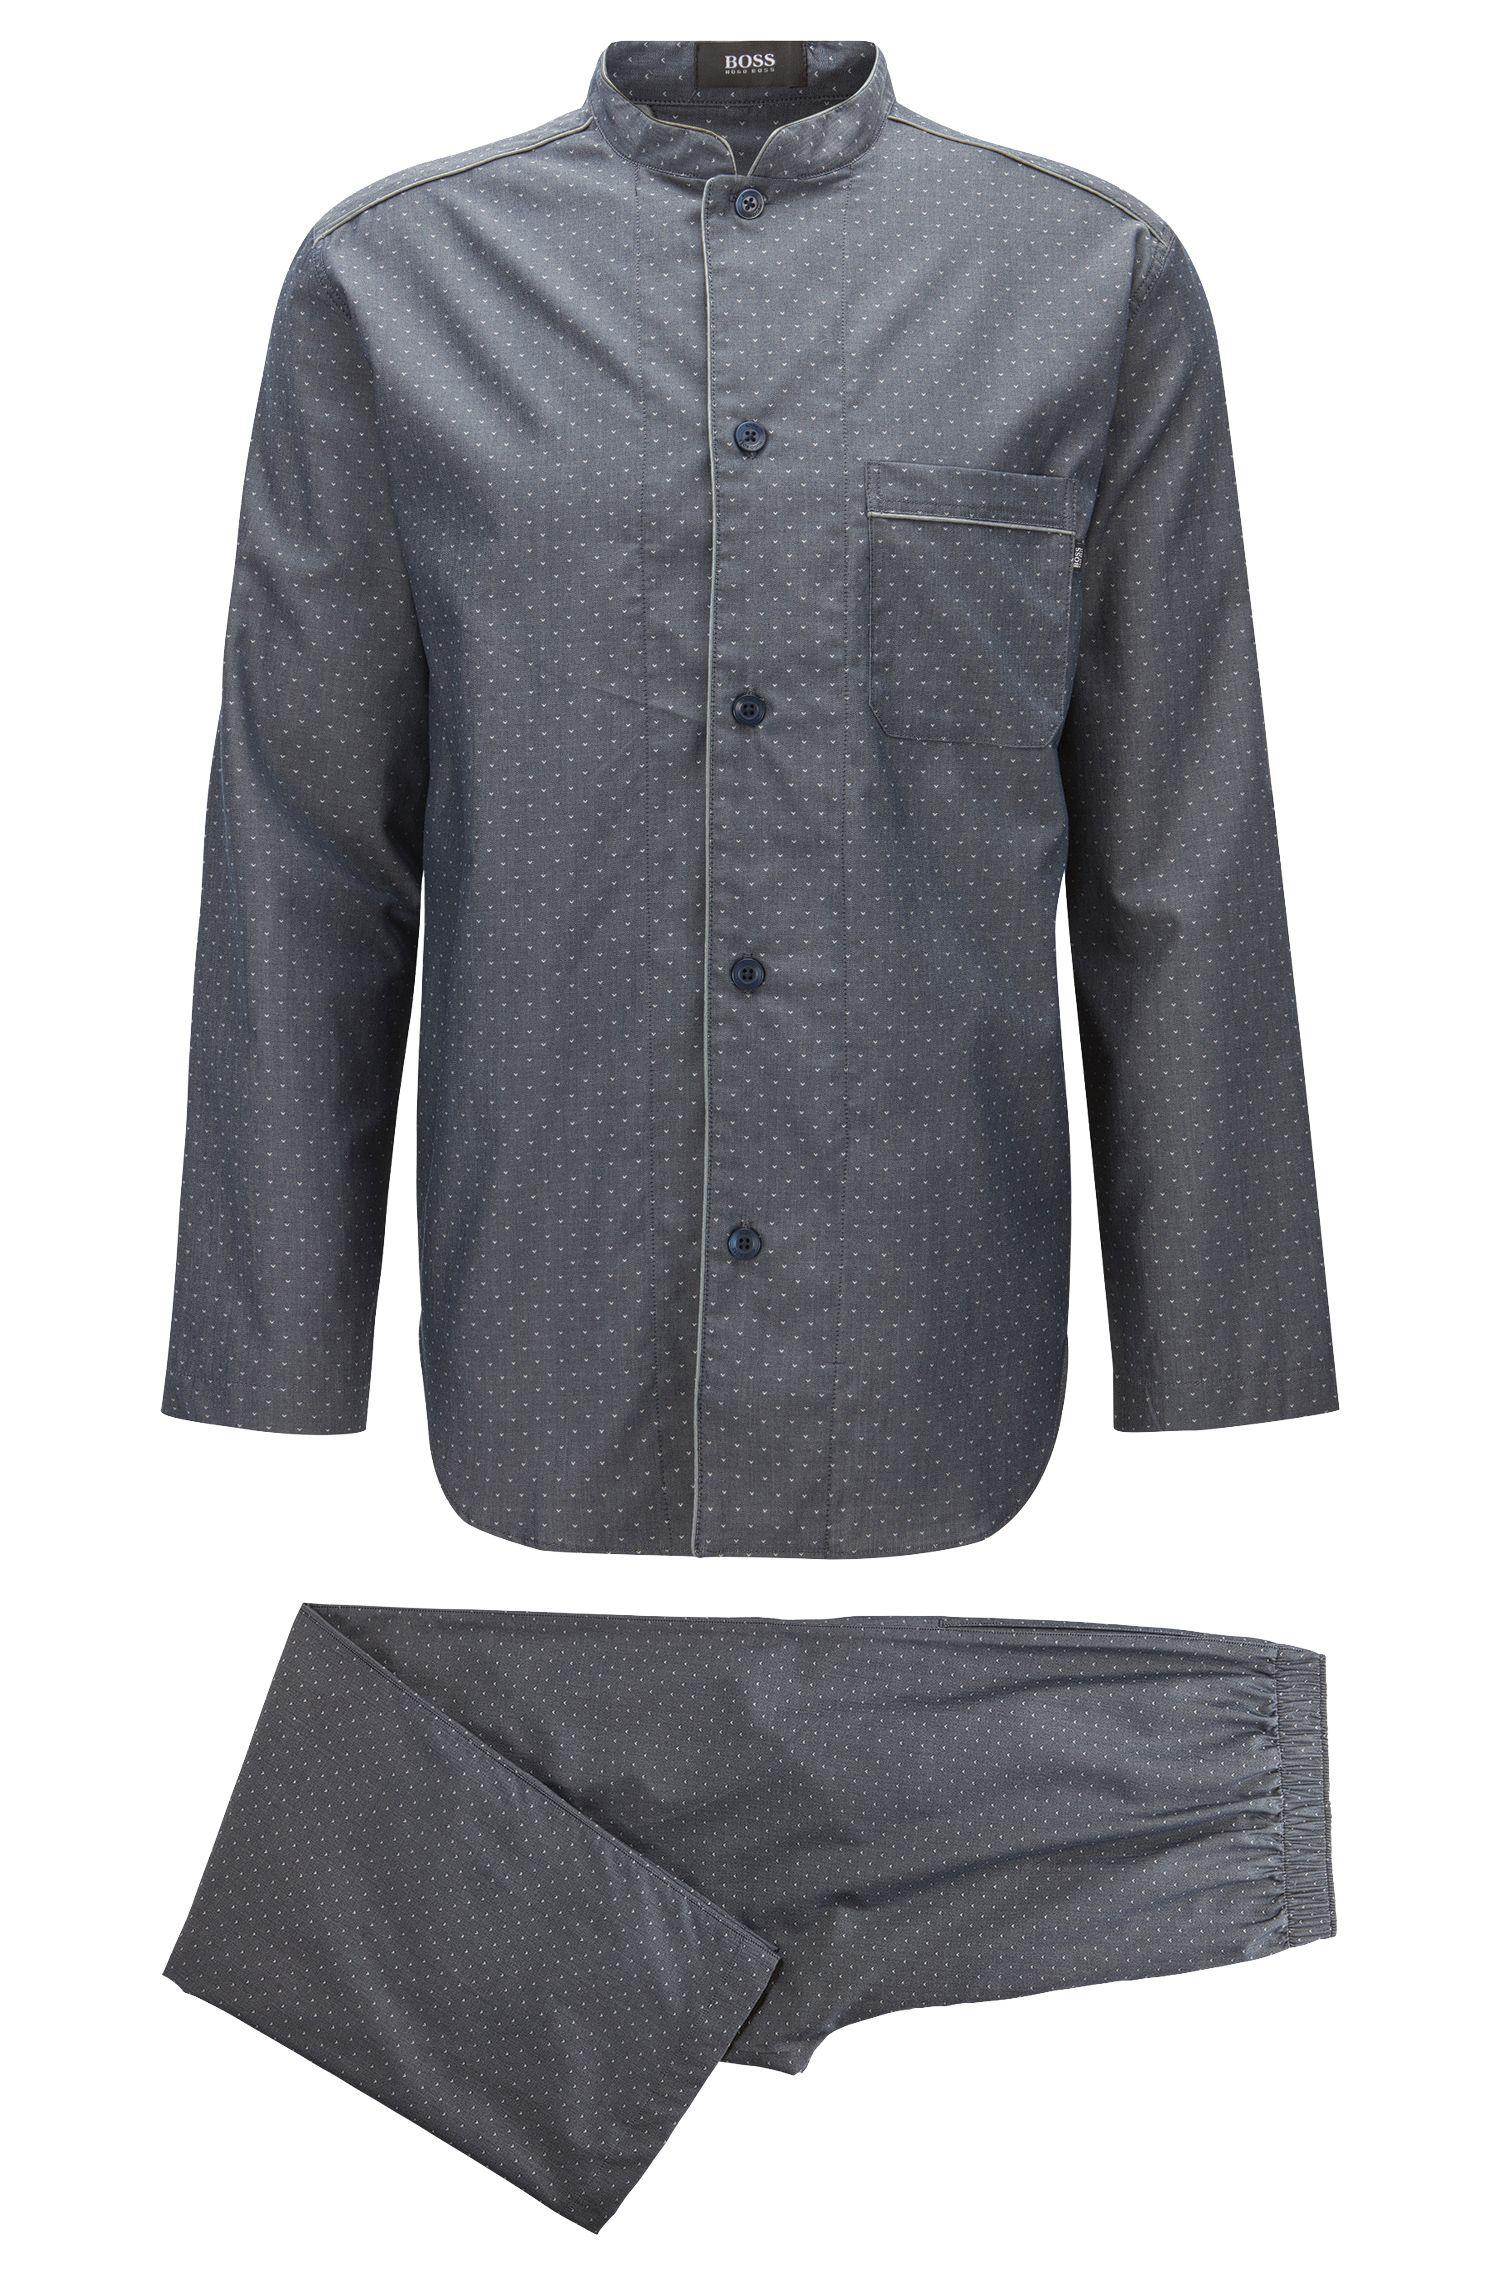 Korean-style pyjamas in soft cotton